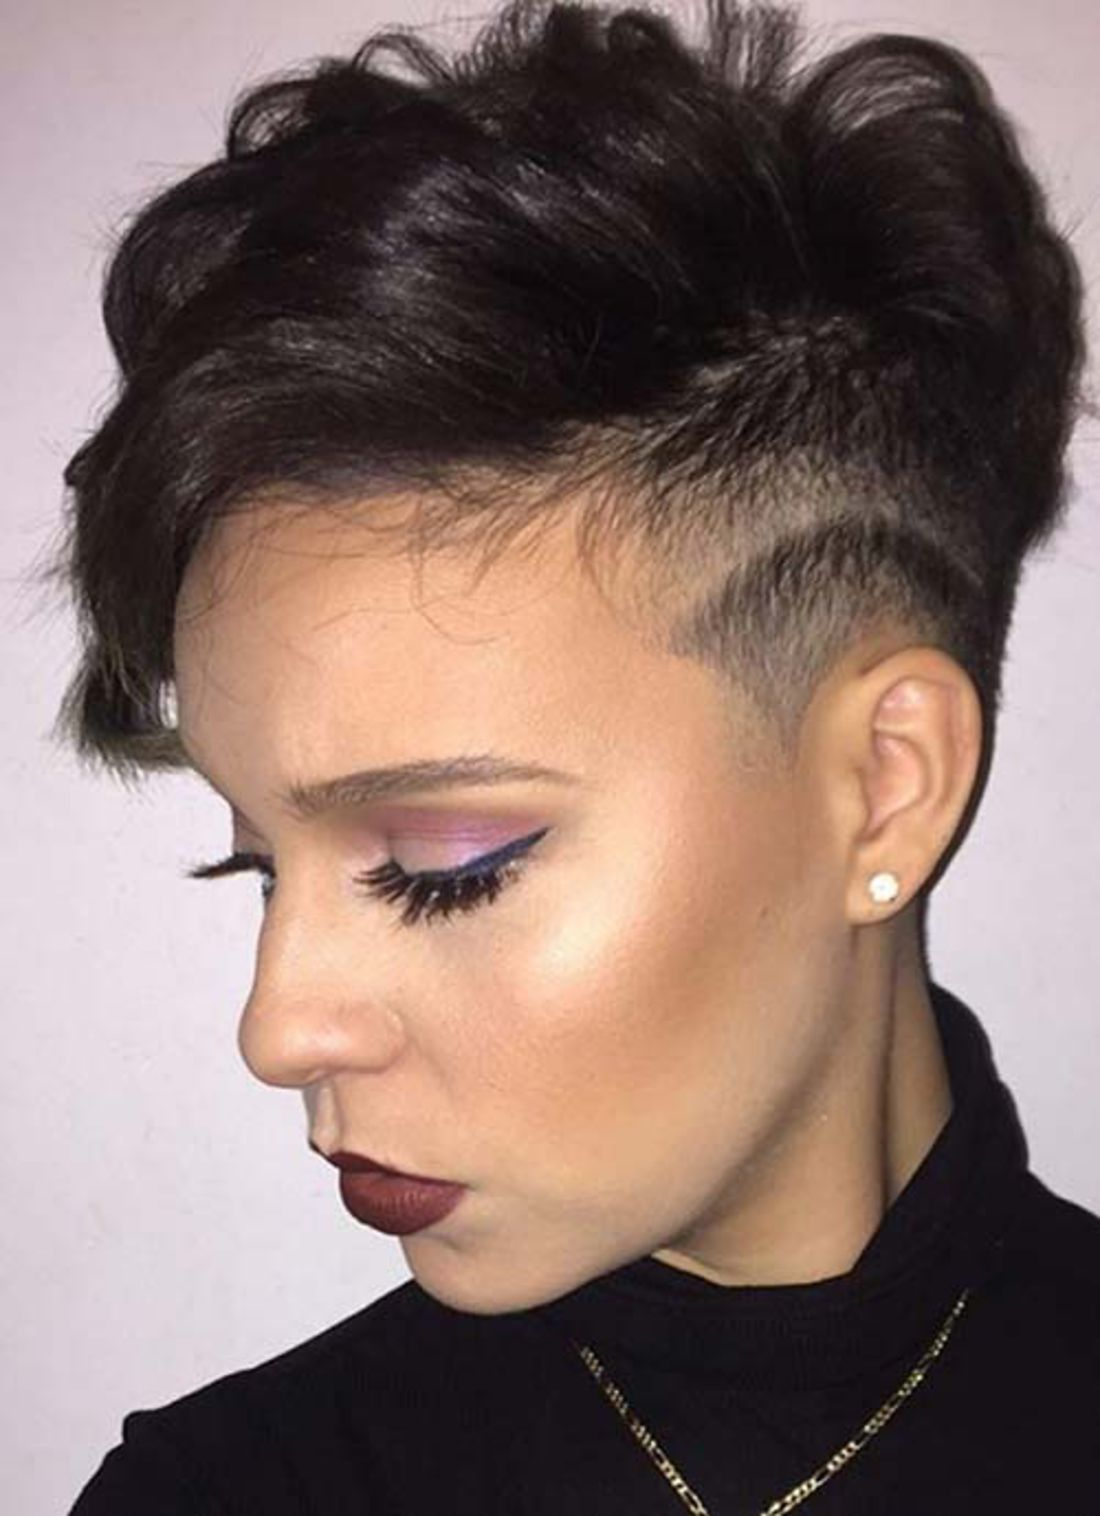 xinegbepal: Rasierte damen